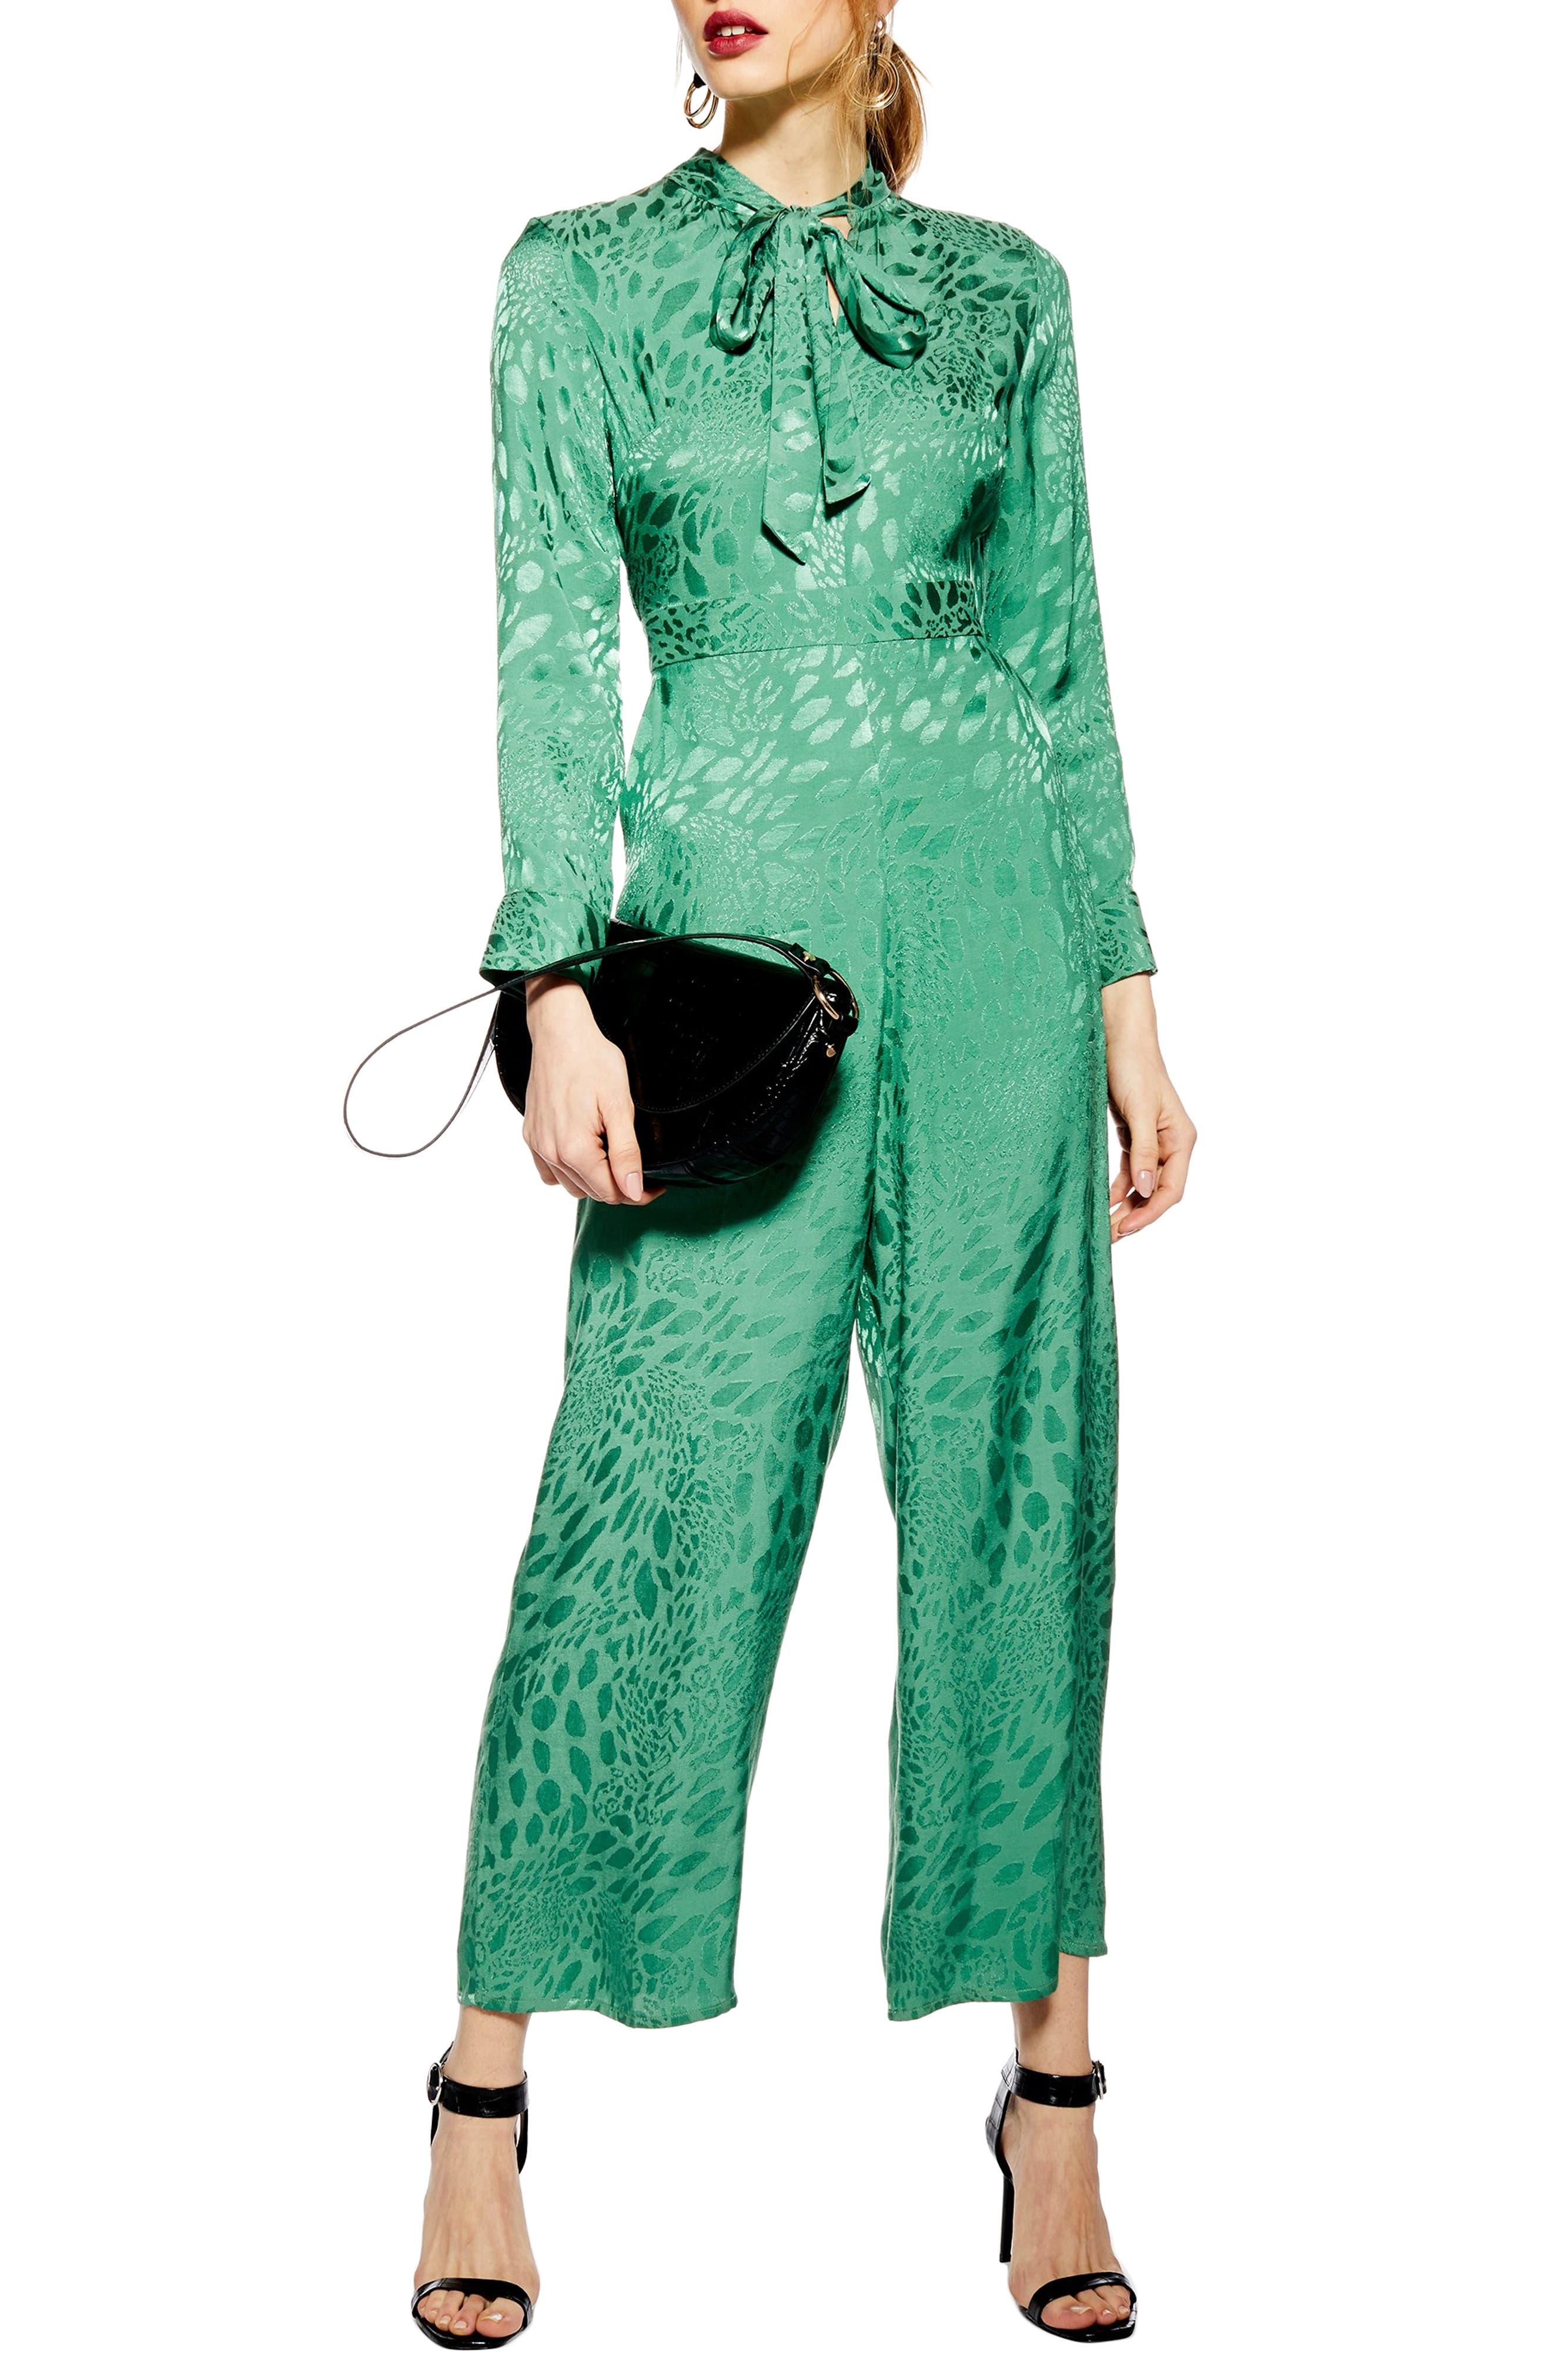 Topshop Tie Neck Jacquard Crop Jumpsuit, US (fits like 6-8) - Green